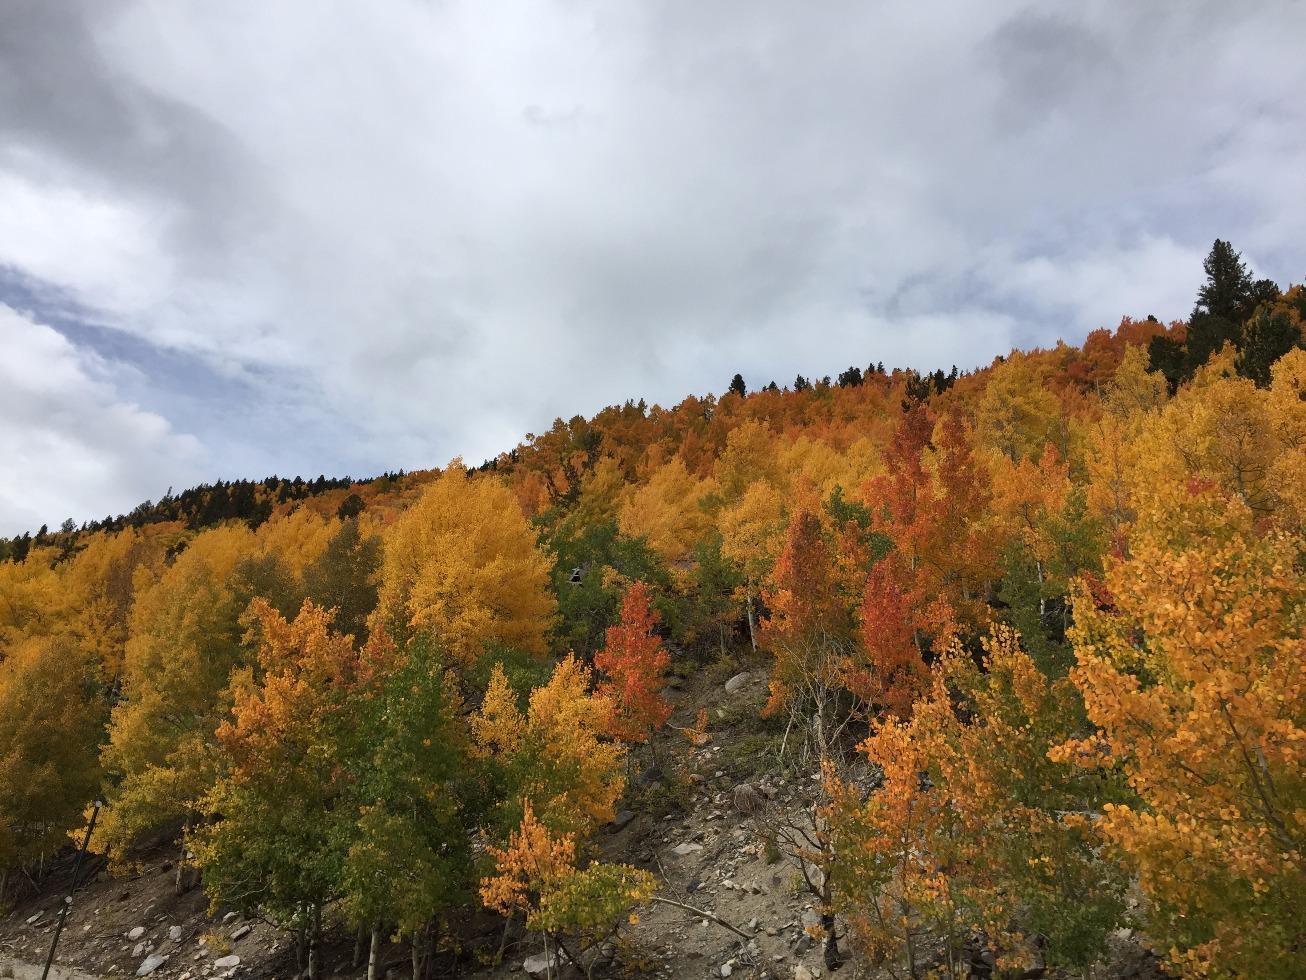 Orange and yellow aspen leaves